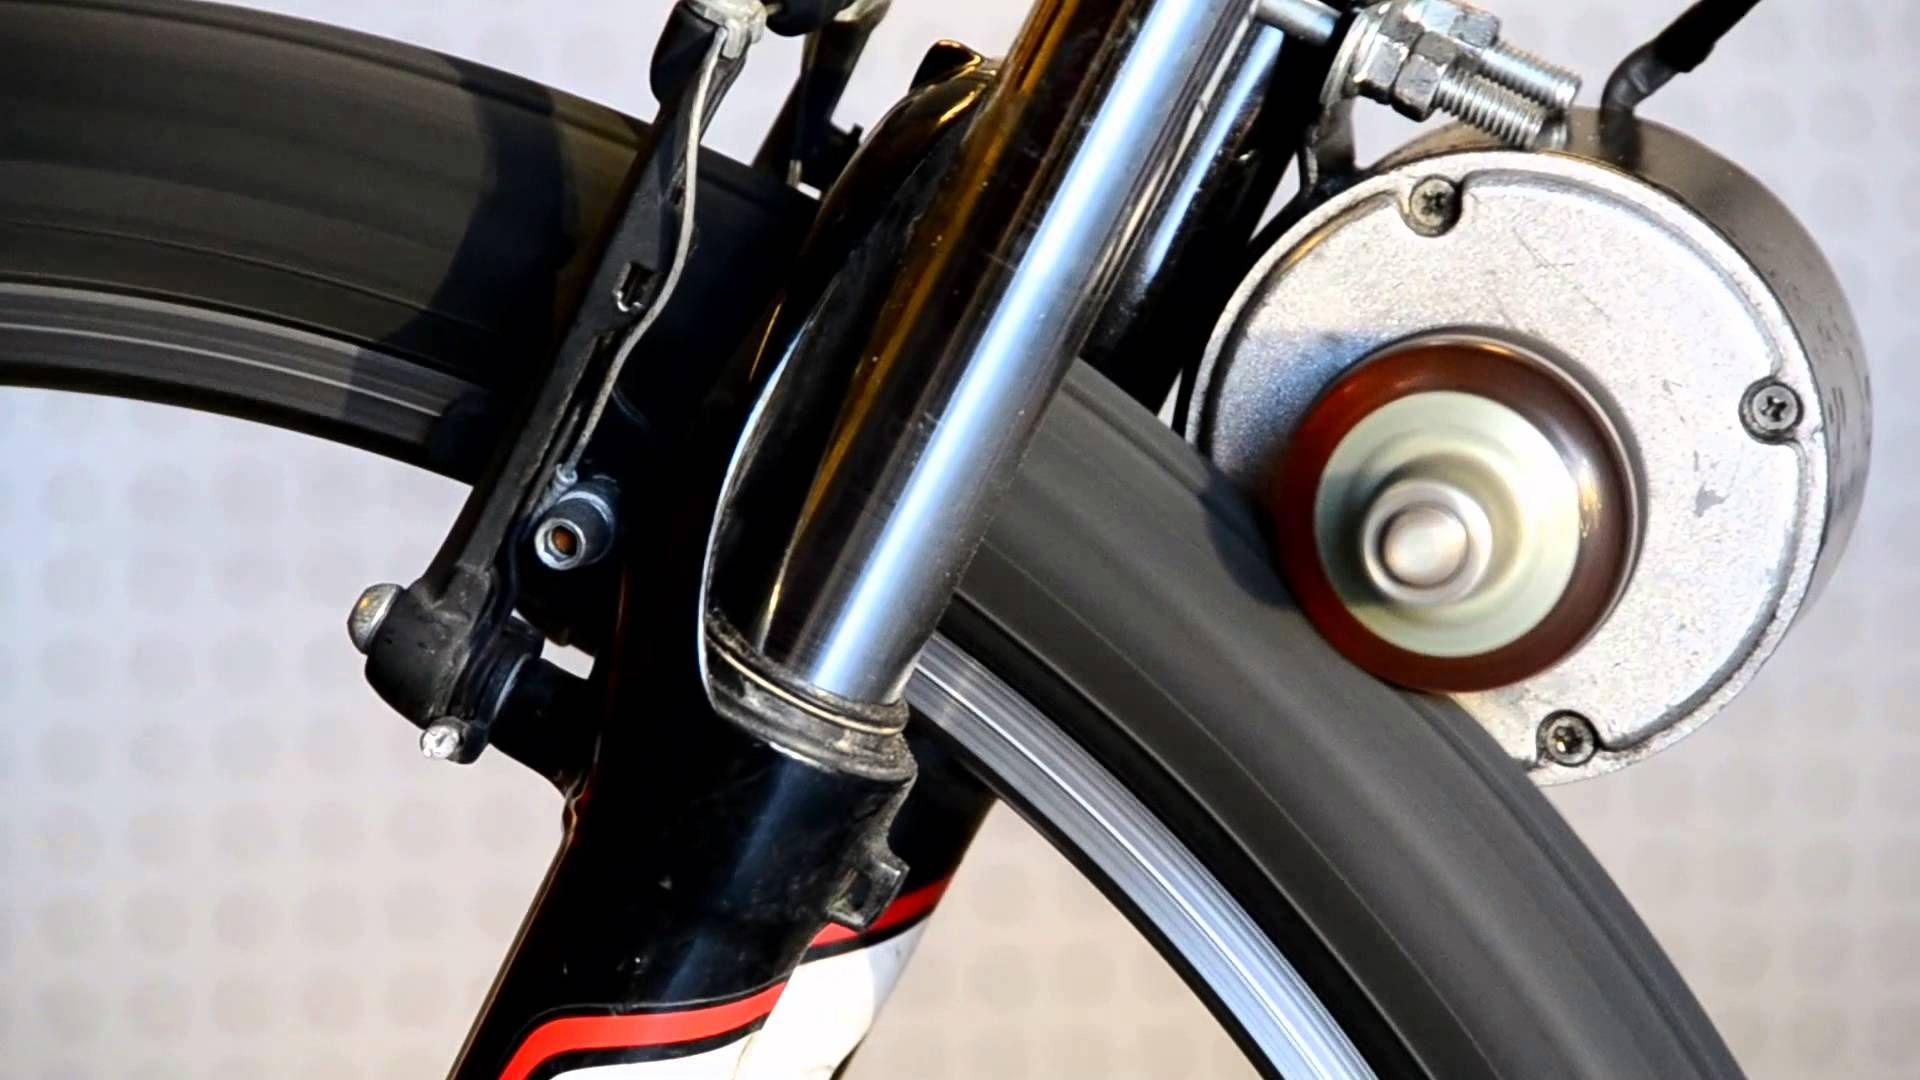 Diy Electric Bike Conversion Electric Bike Diy Motorized Bicycle Electric Bike Conversion